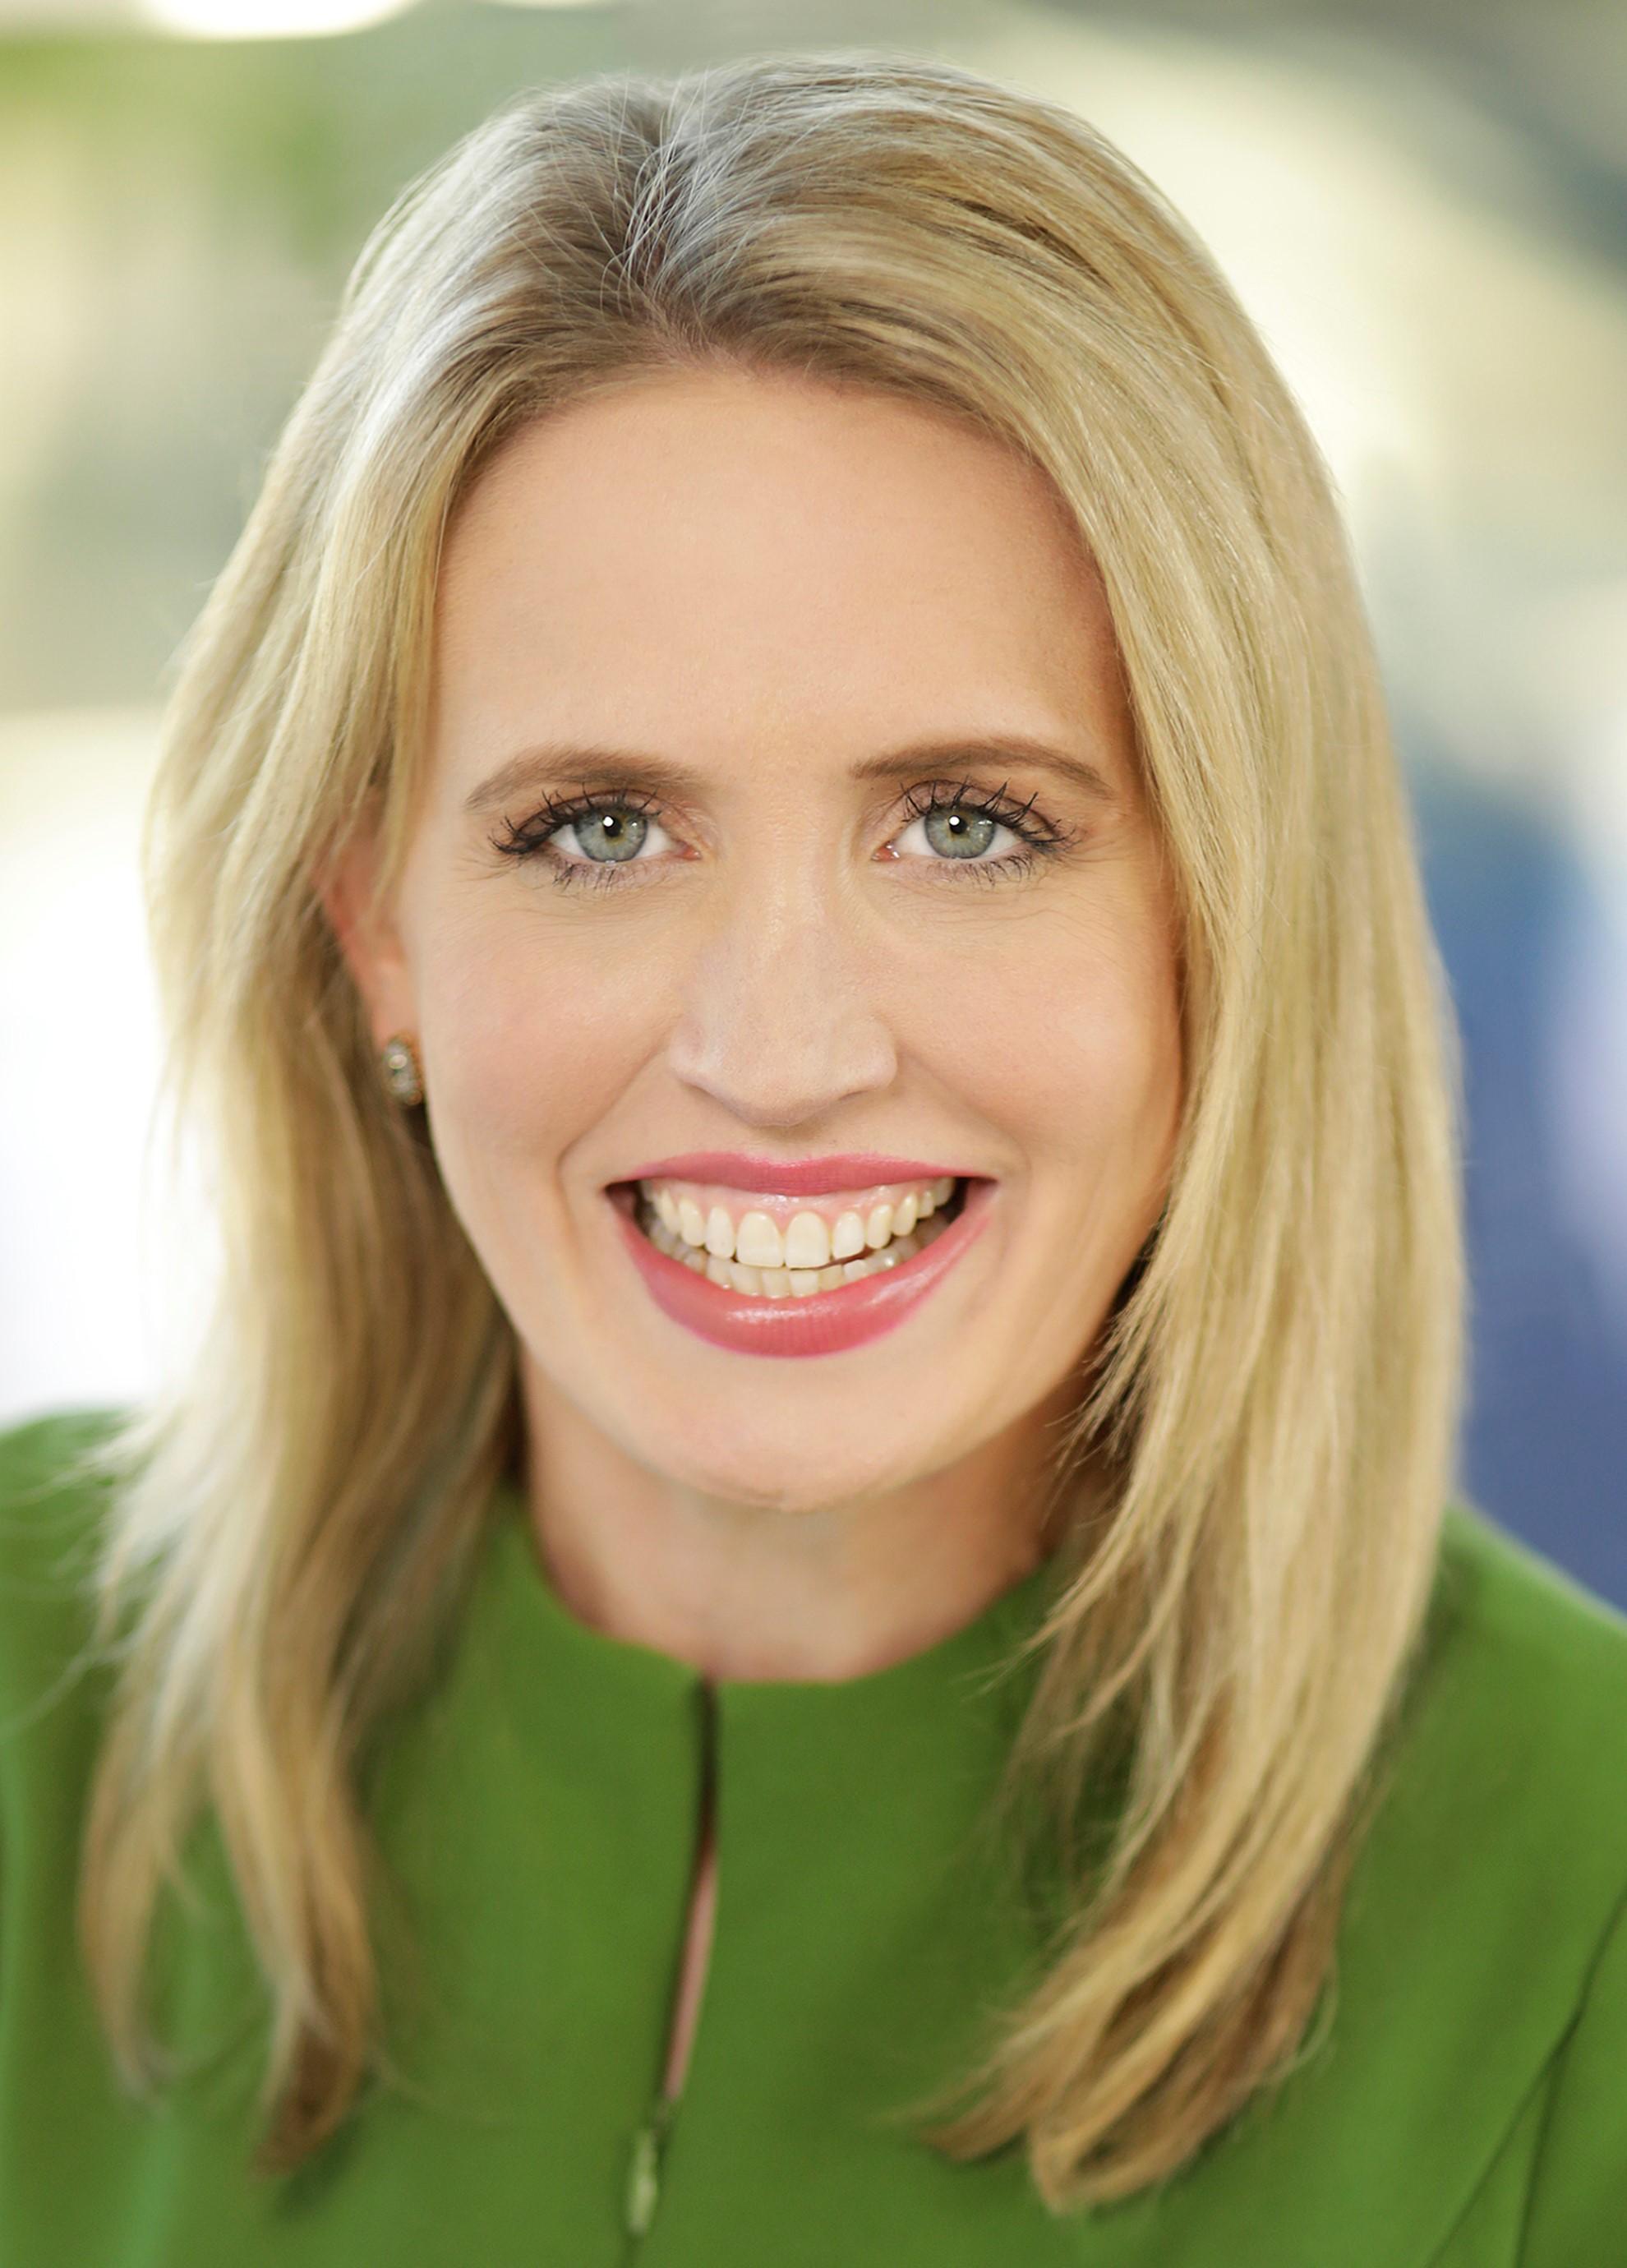 Kate Jones Headshot Current June 18.jpg